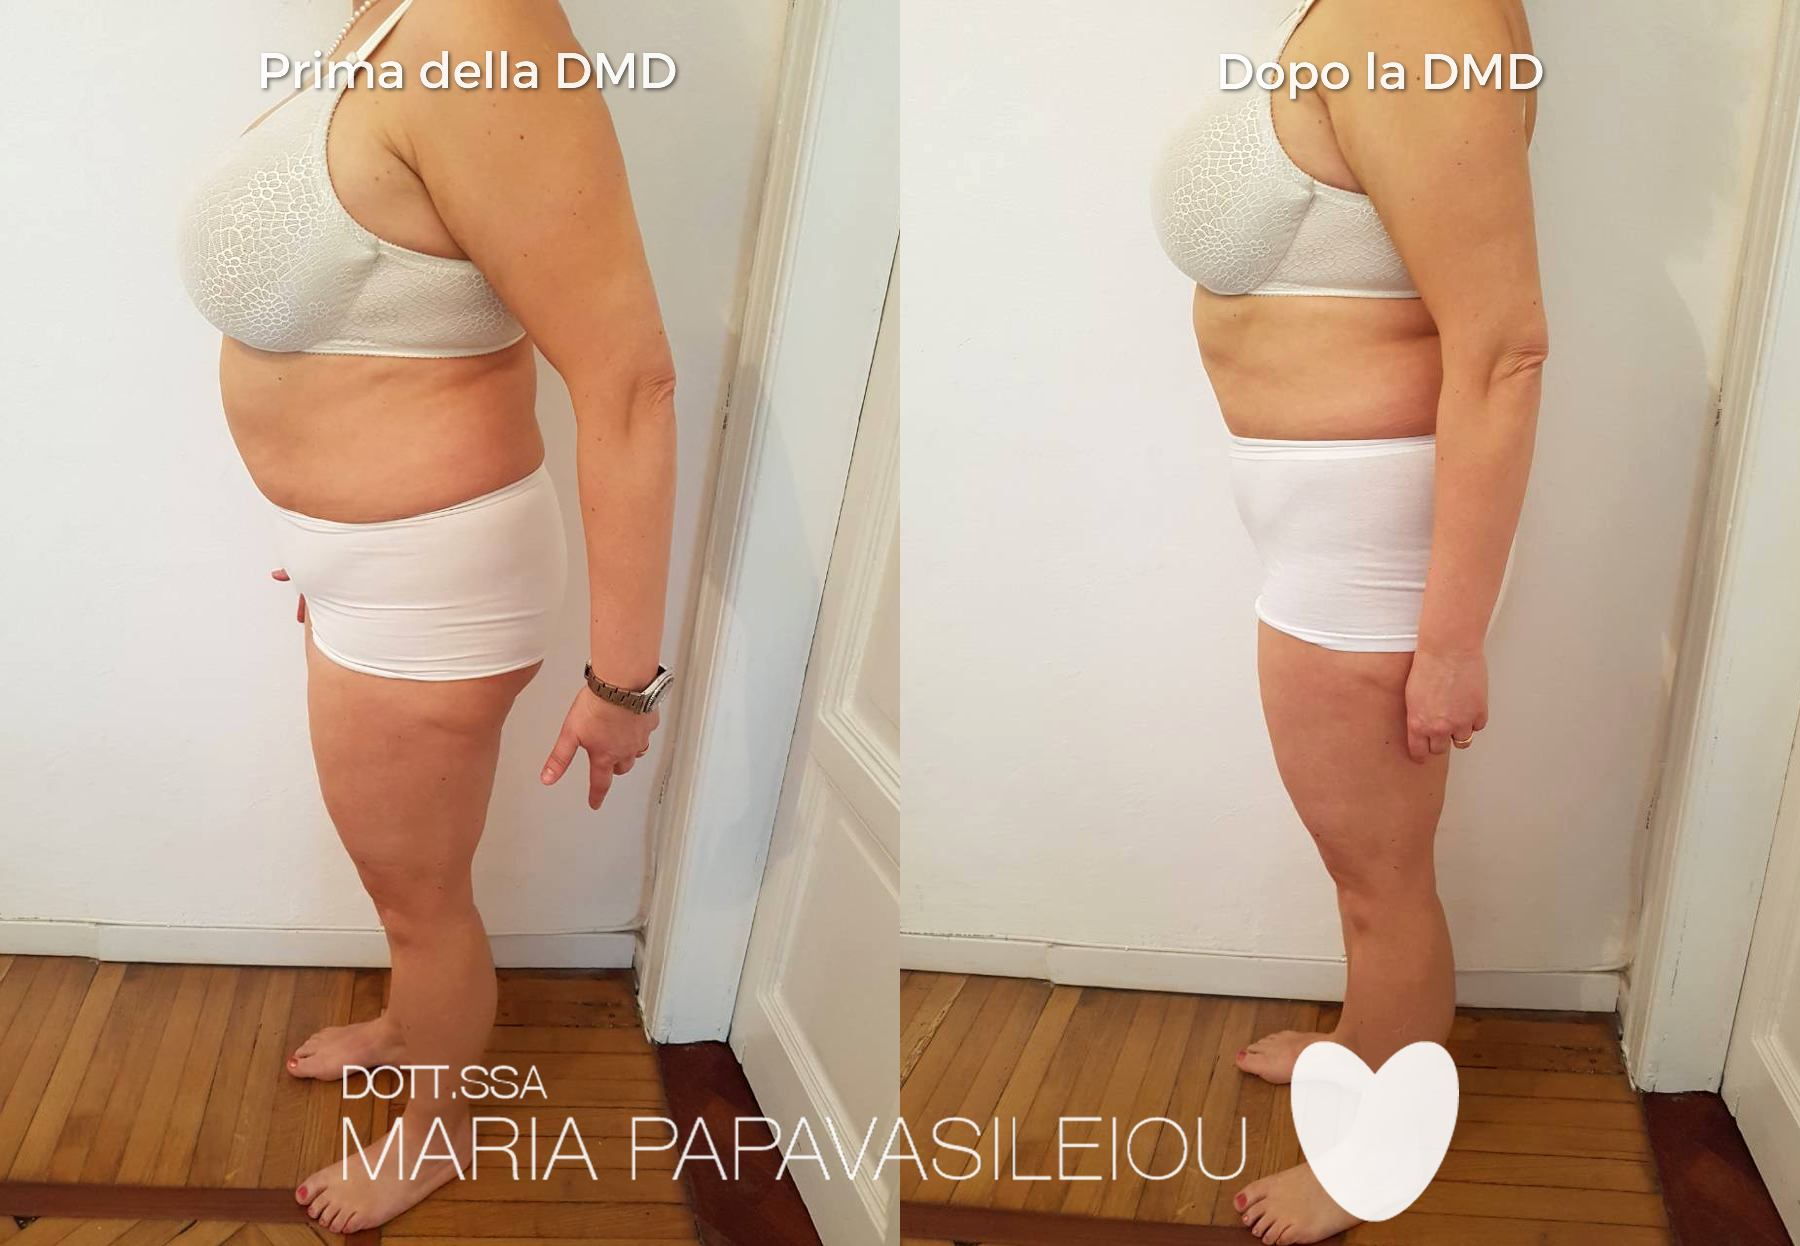 Dieta Personalizzata - Nutrizionista e dietista Dott.ssa Maria Papavasileiou